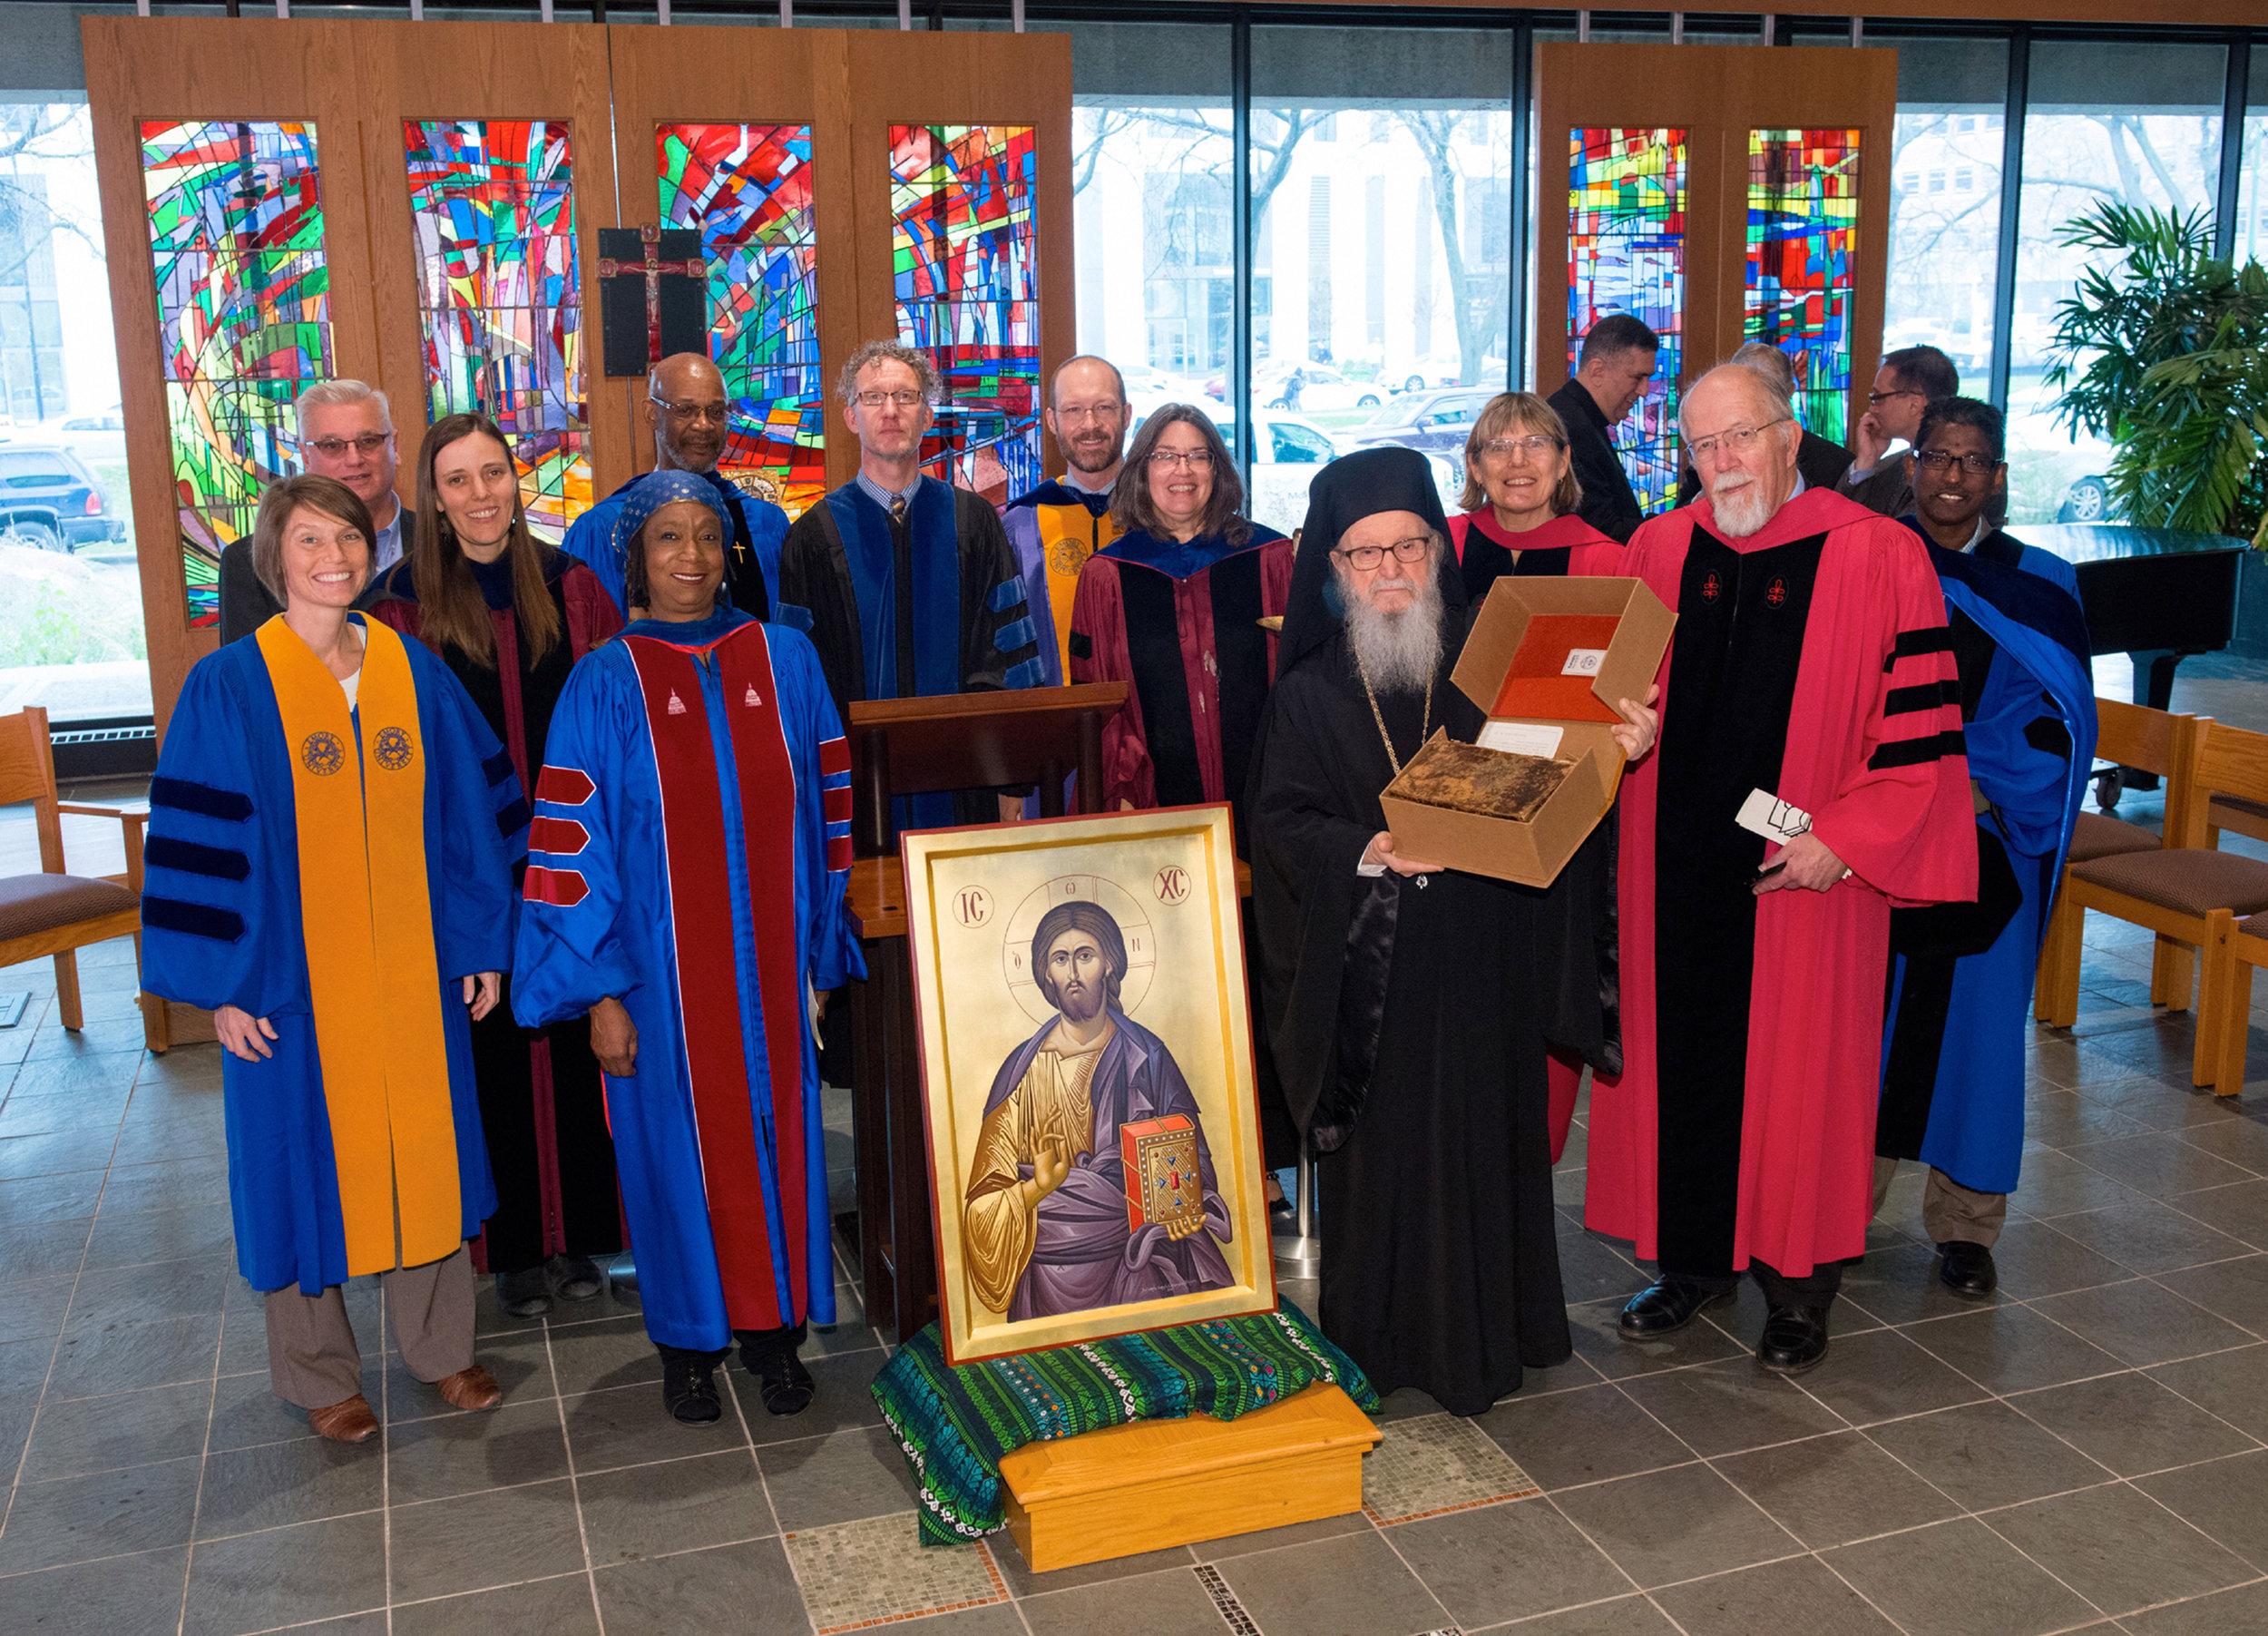 LSTC-faculty-Archbishop-LSTCRareNT372.jpg